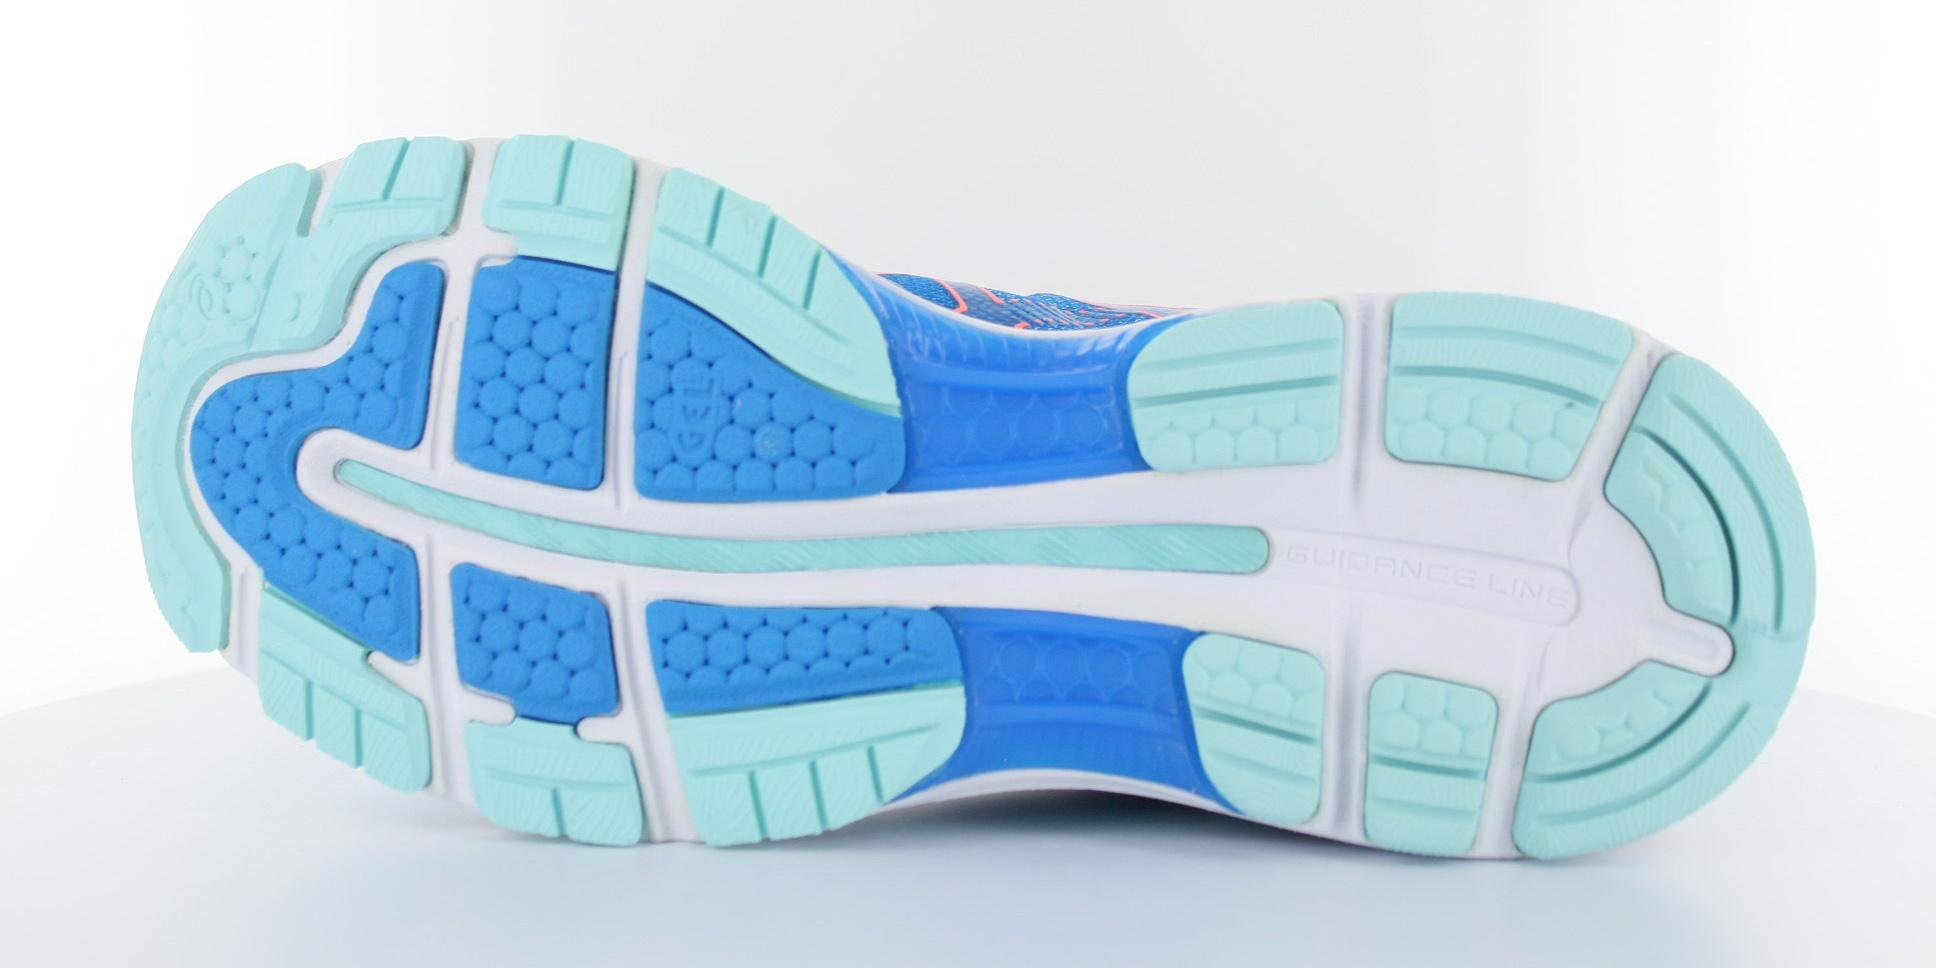 Shoe Review: Asics Nimbus 19 Kintec: Footwear + Orthotics  Kintec: Footwear + Orthotics